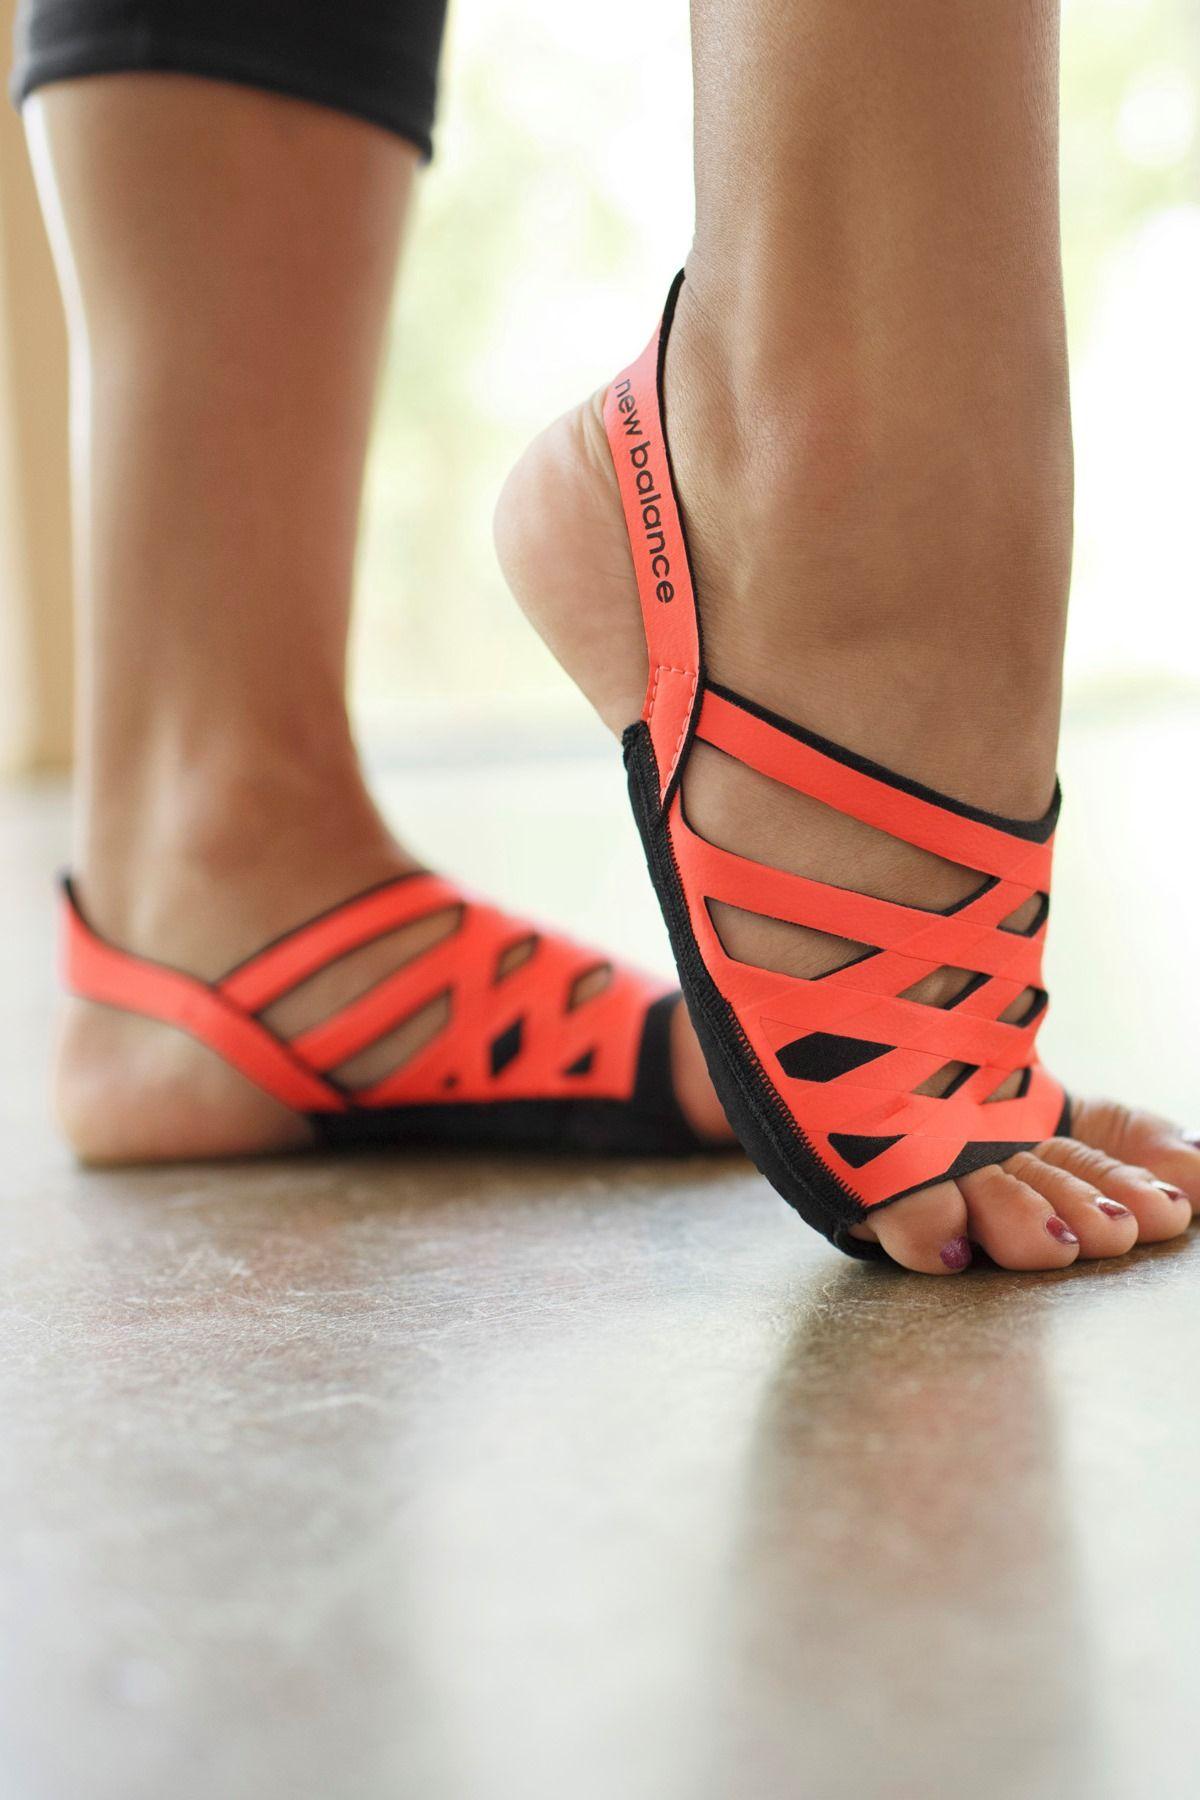 new balance women's studio skin shoes